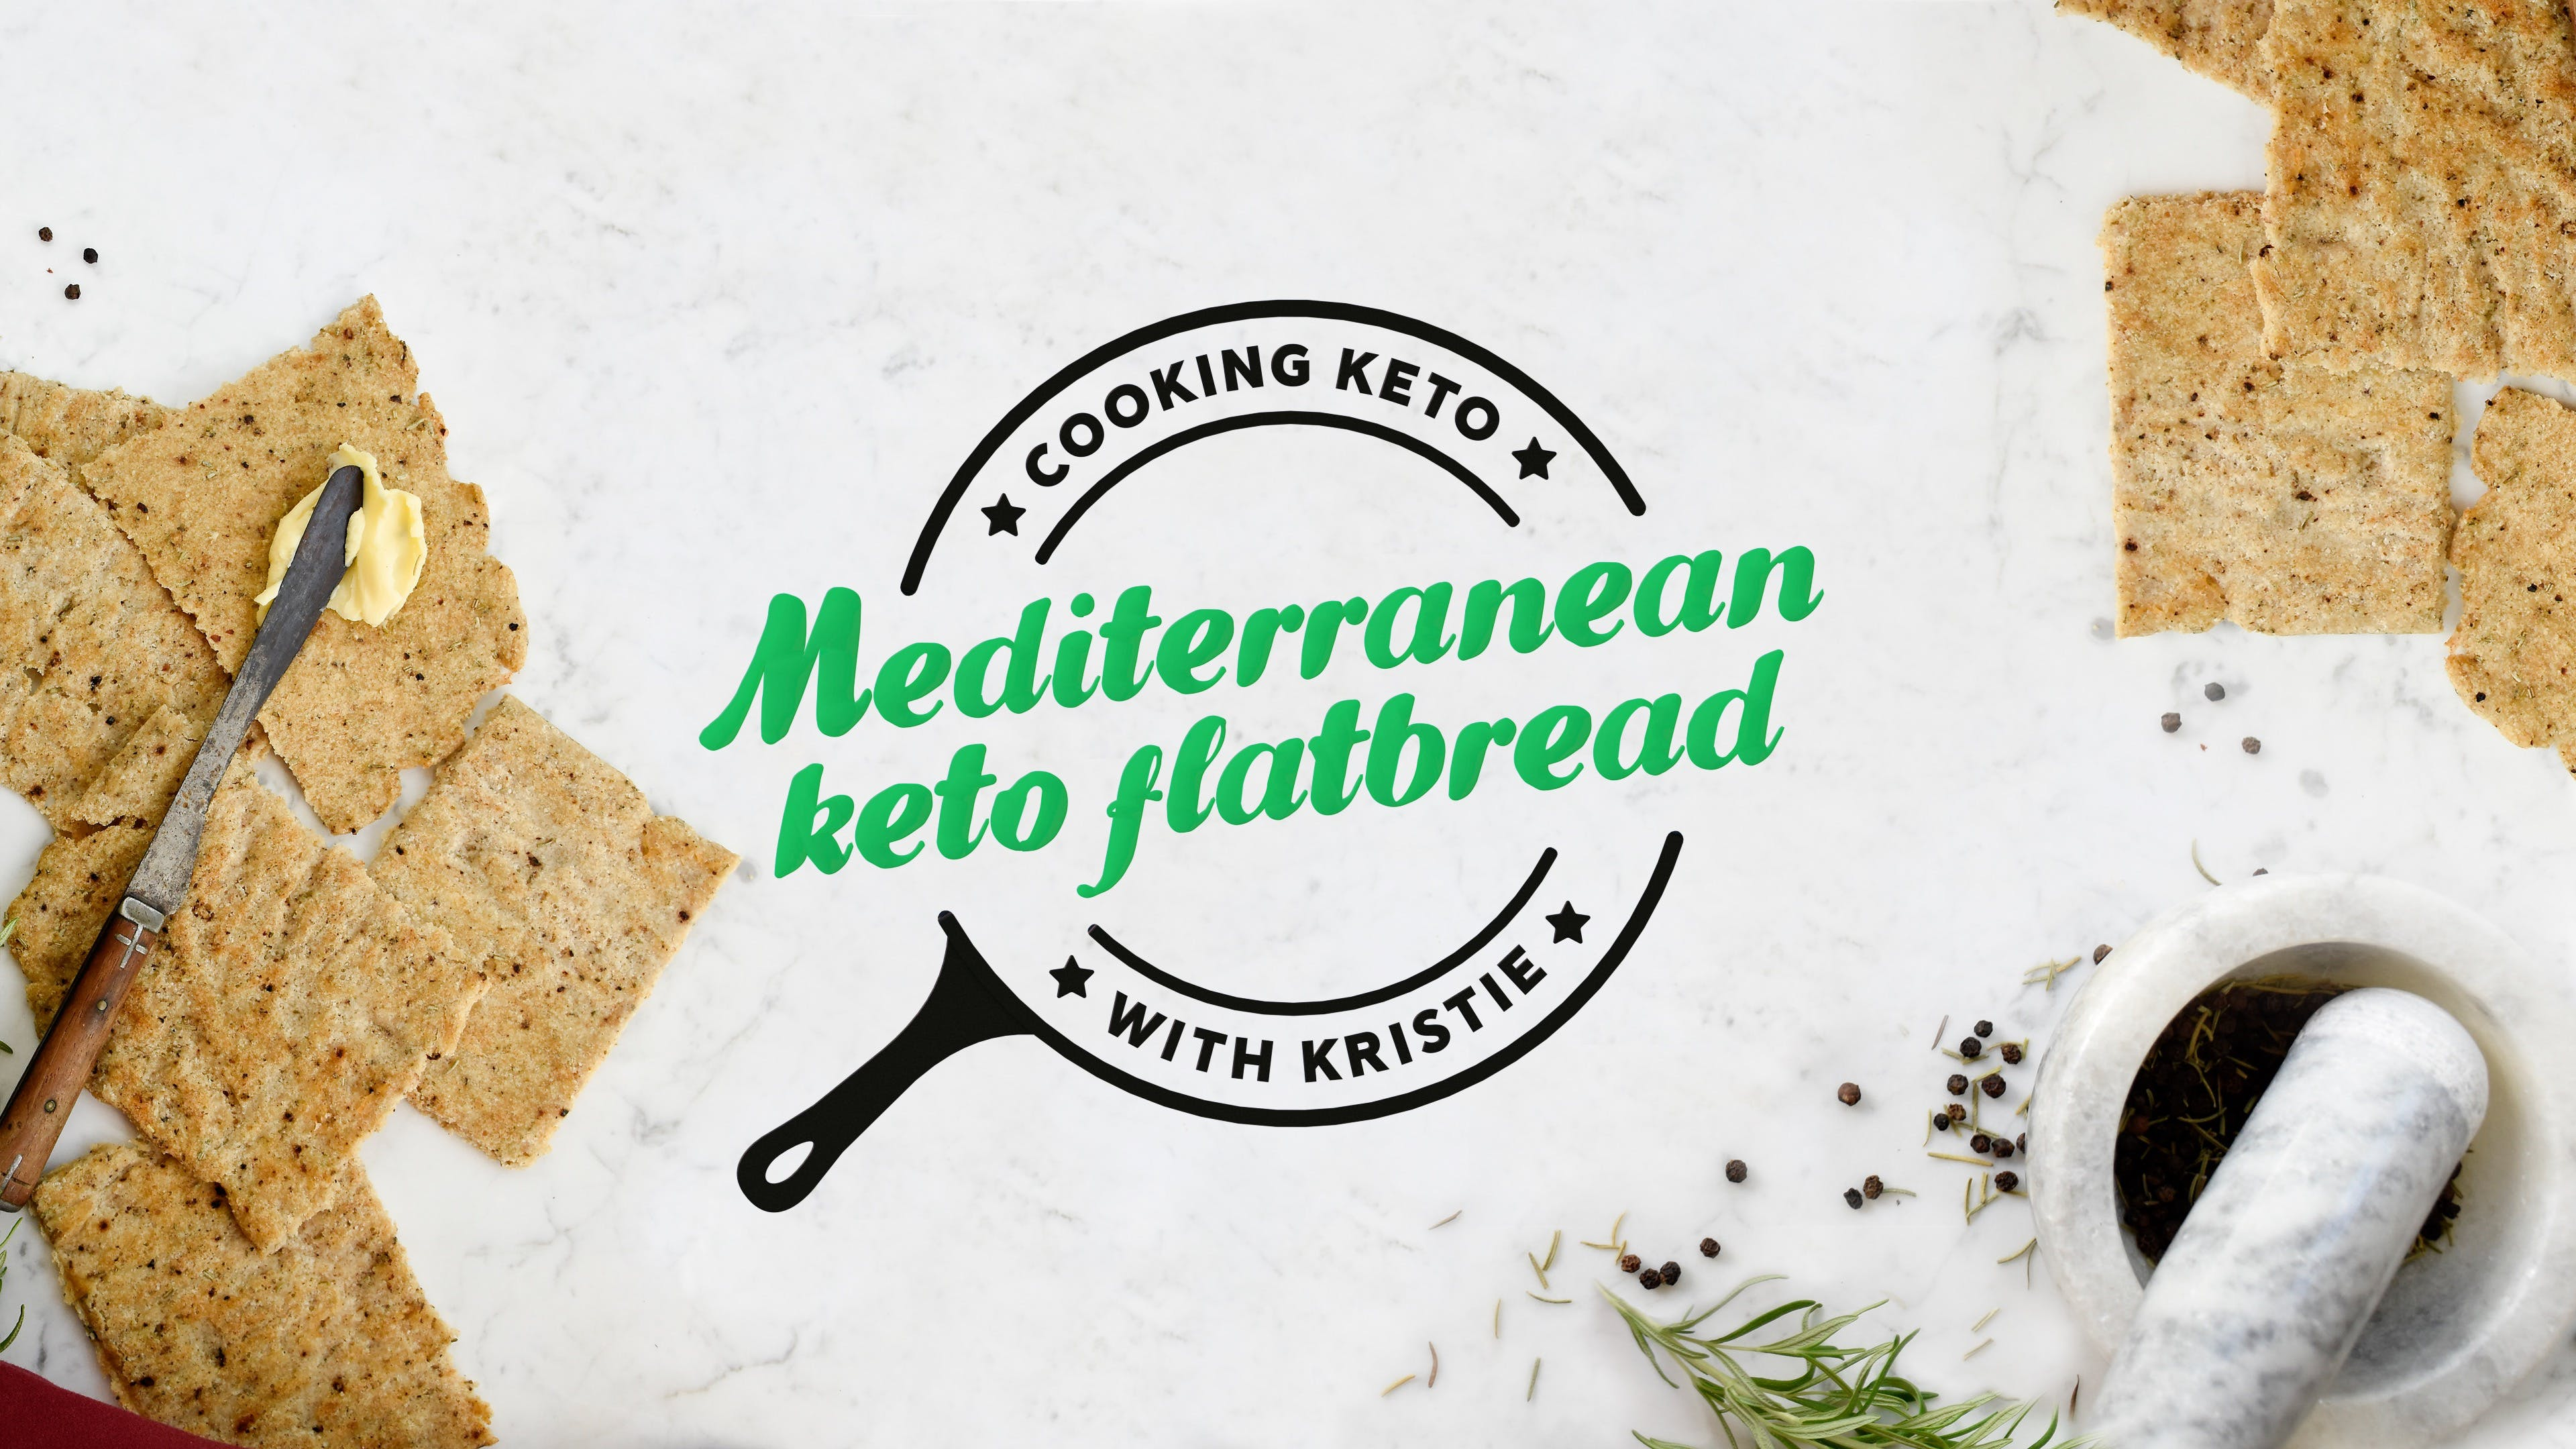 Cooking keto with Kristie –Mediterranean keto flatbread